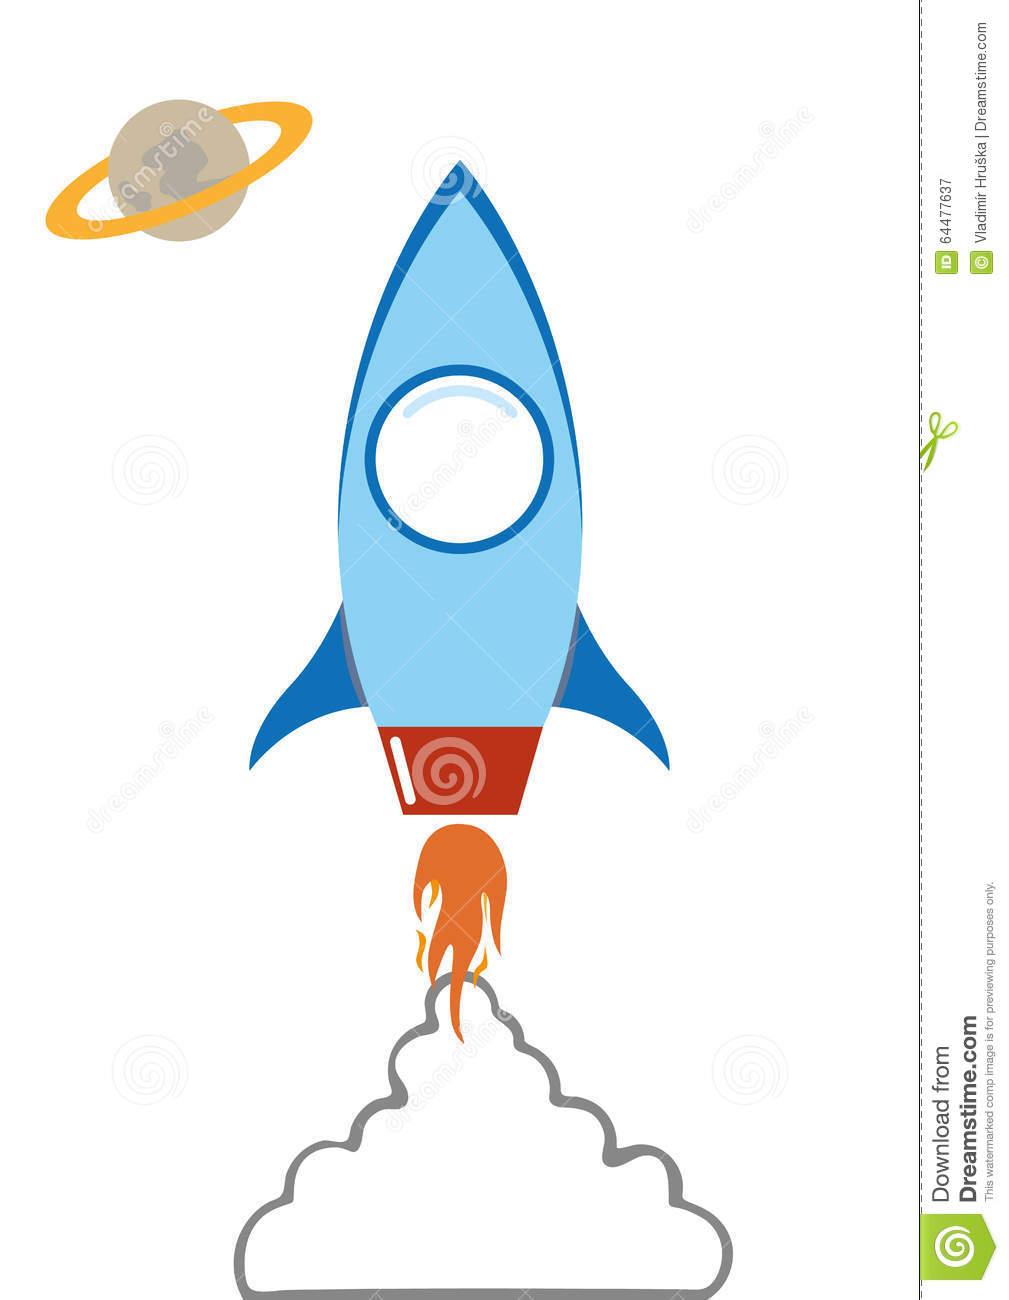 Pictures free download best. Clipart rocket cloud